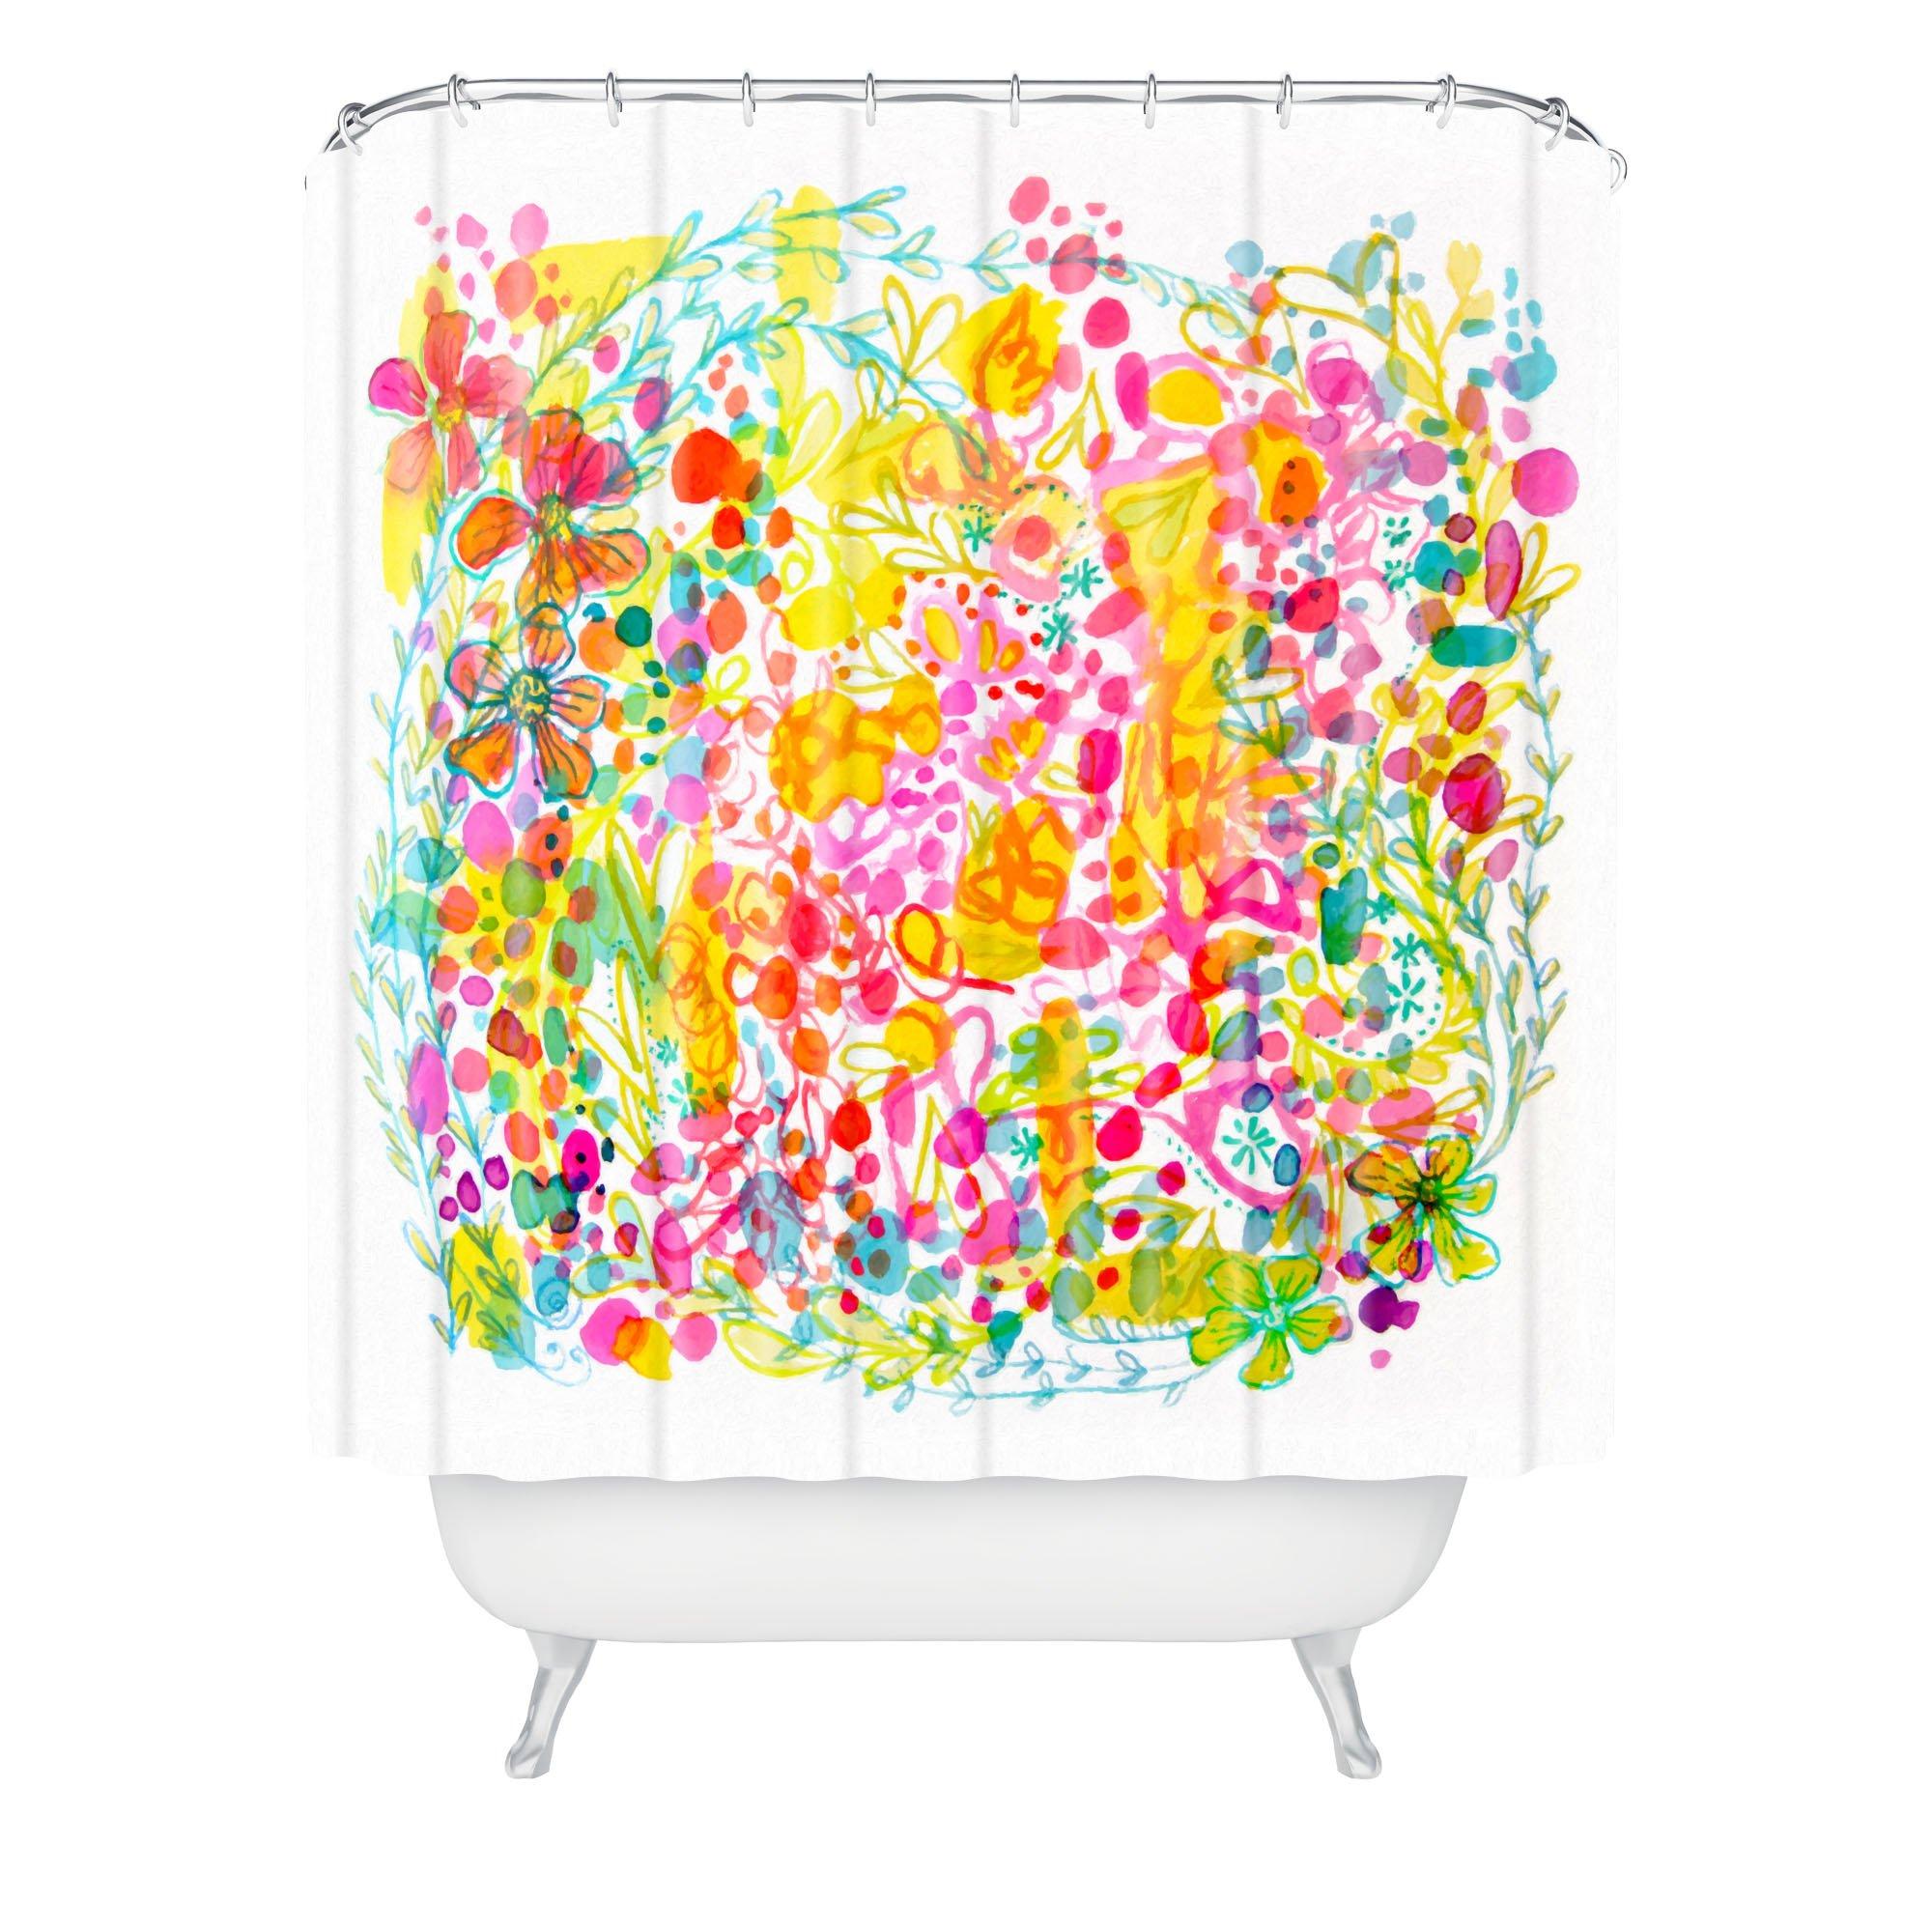 Deny Designs Stephanie Corfee Bubble Garden Shower Curtain, 69'' x 72''